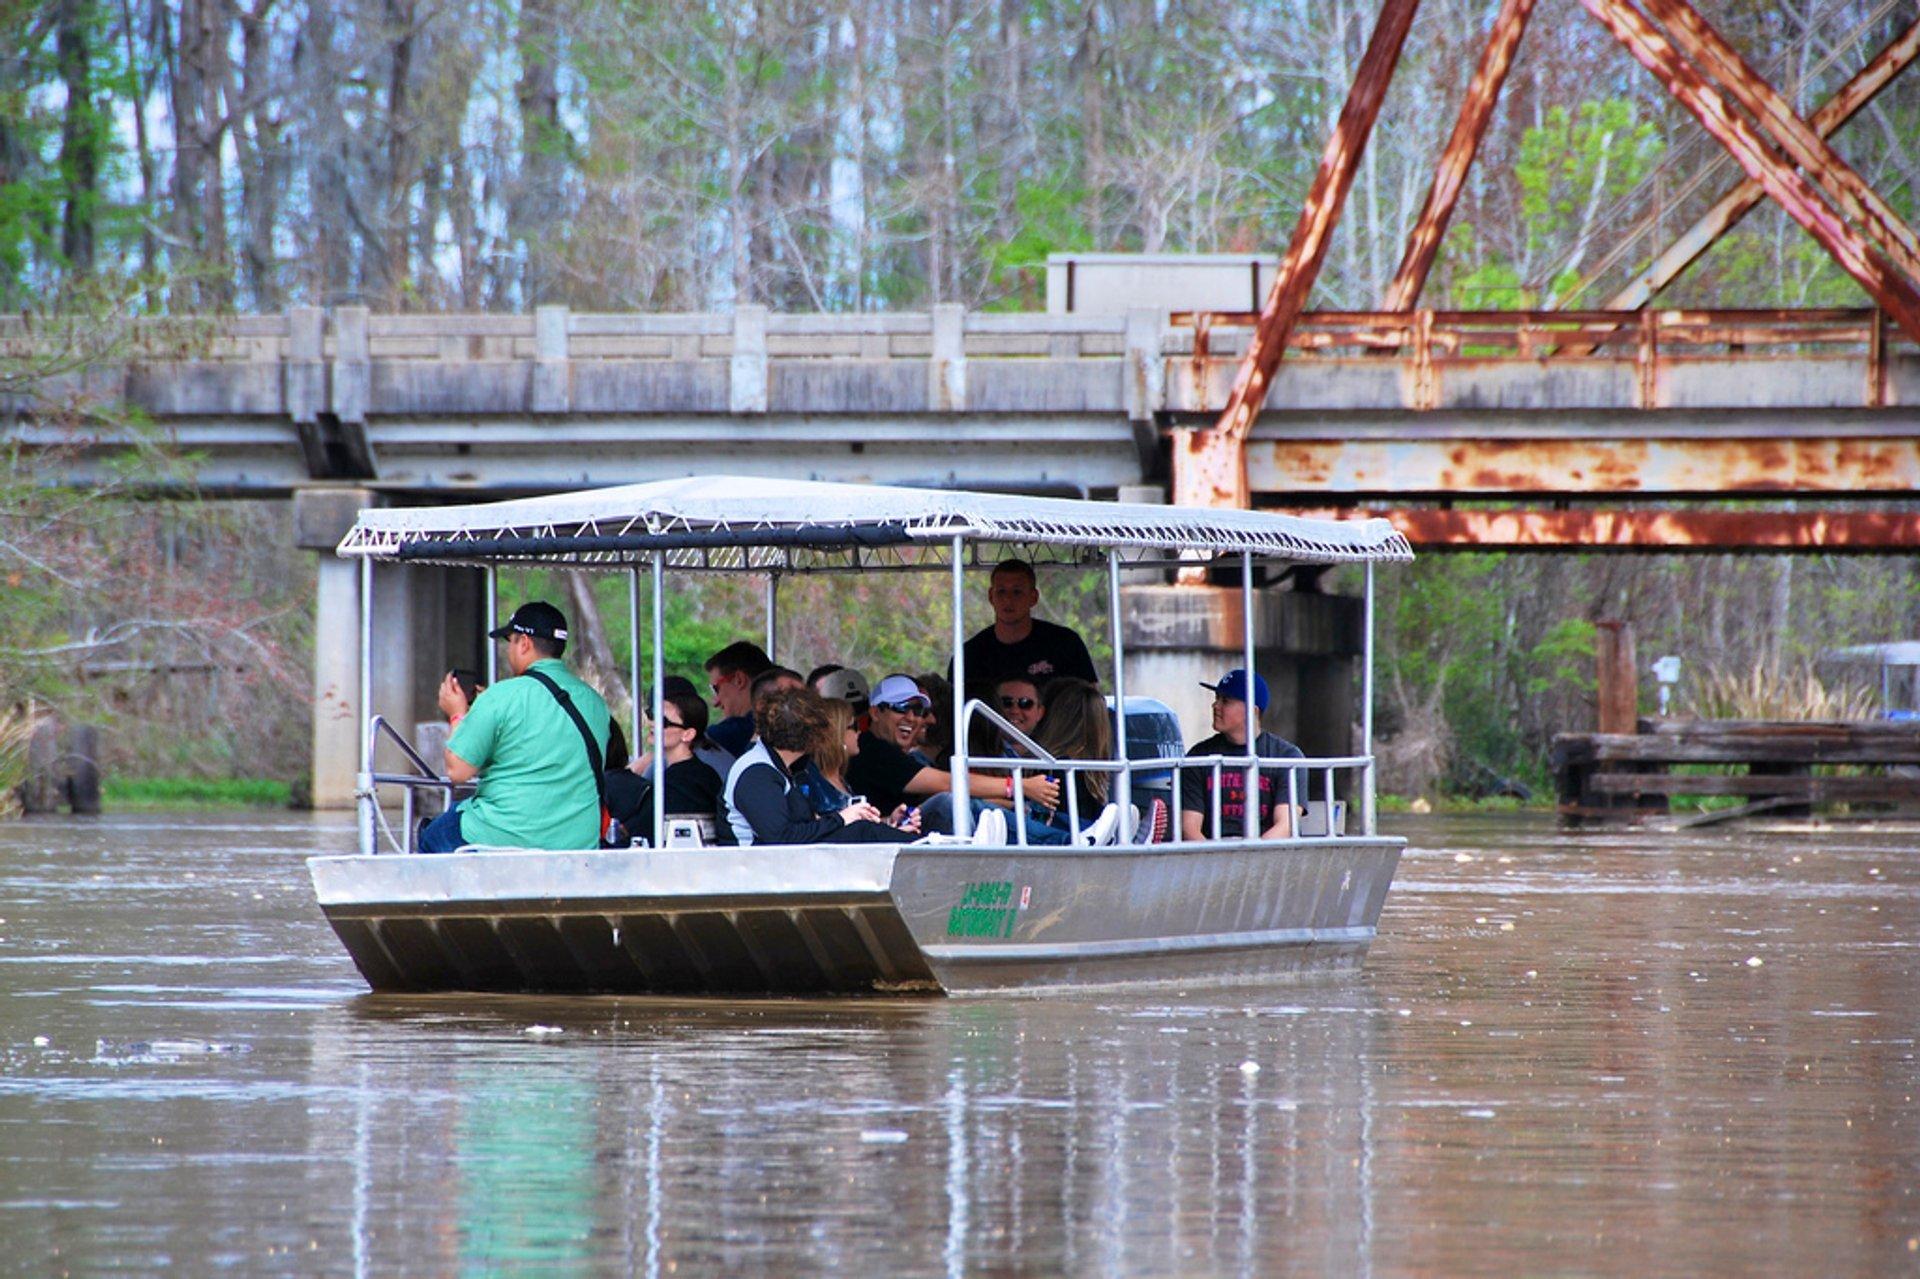 Honey Island Swamp tour in St. Tammany Parish 2020